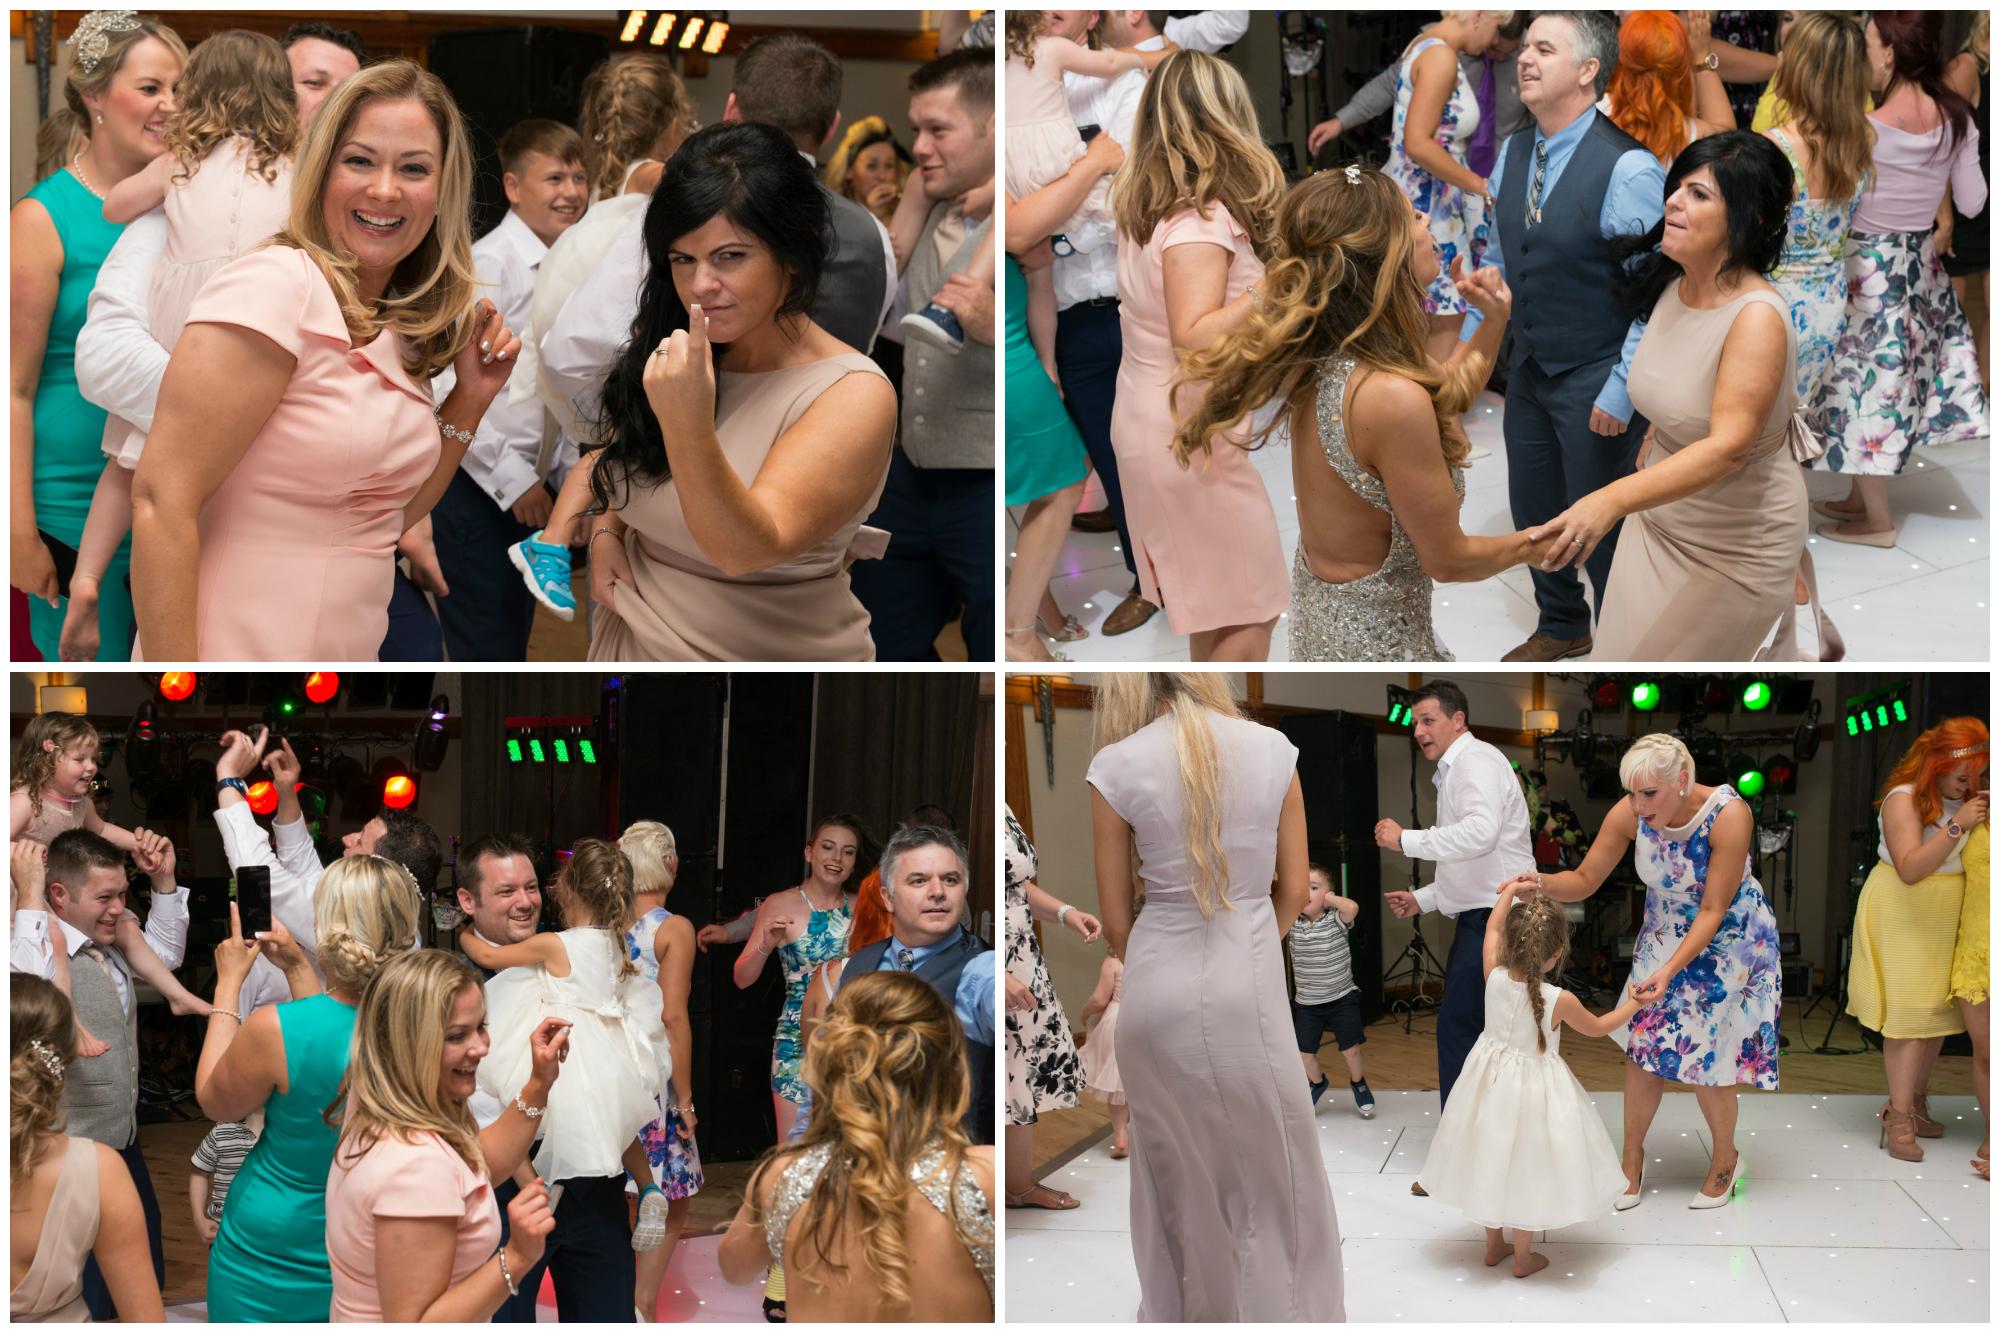 Lusty Beg Island Northern Ireland Wedding Photographer Pure Photo N.I the dancing